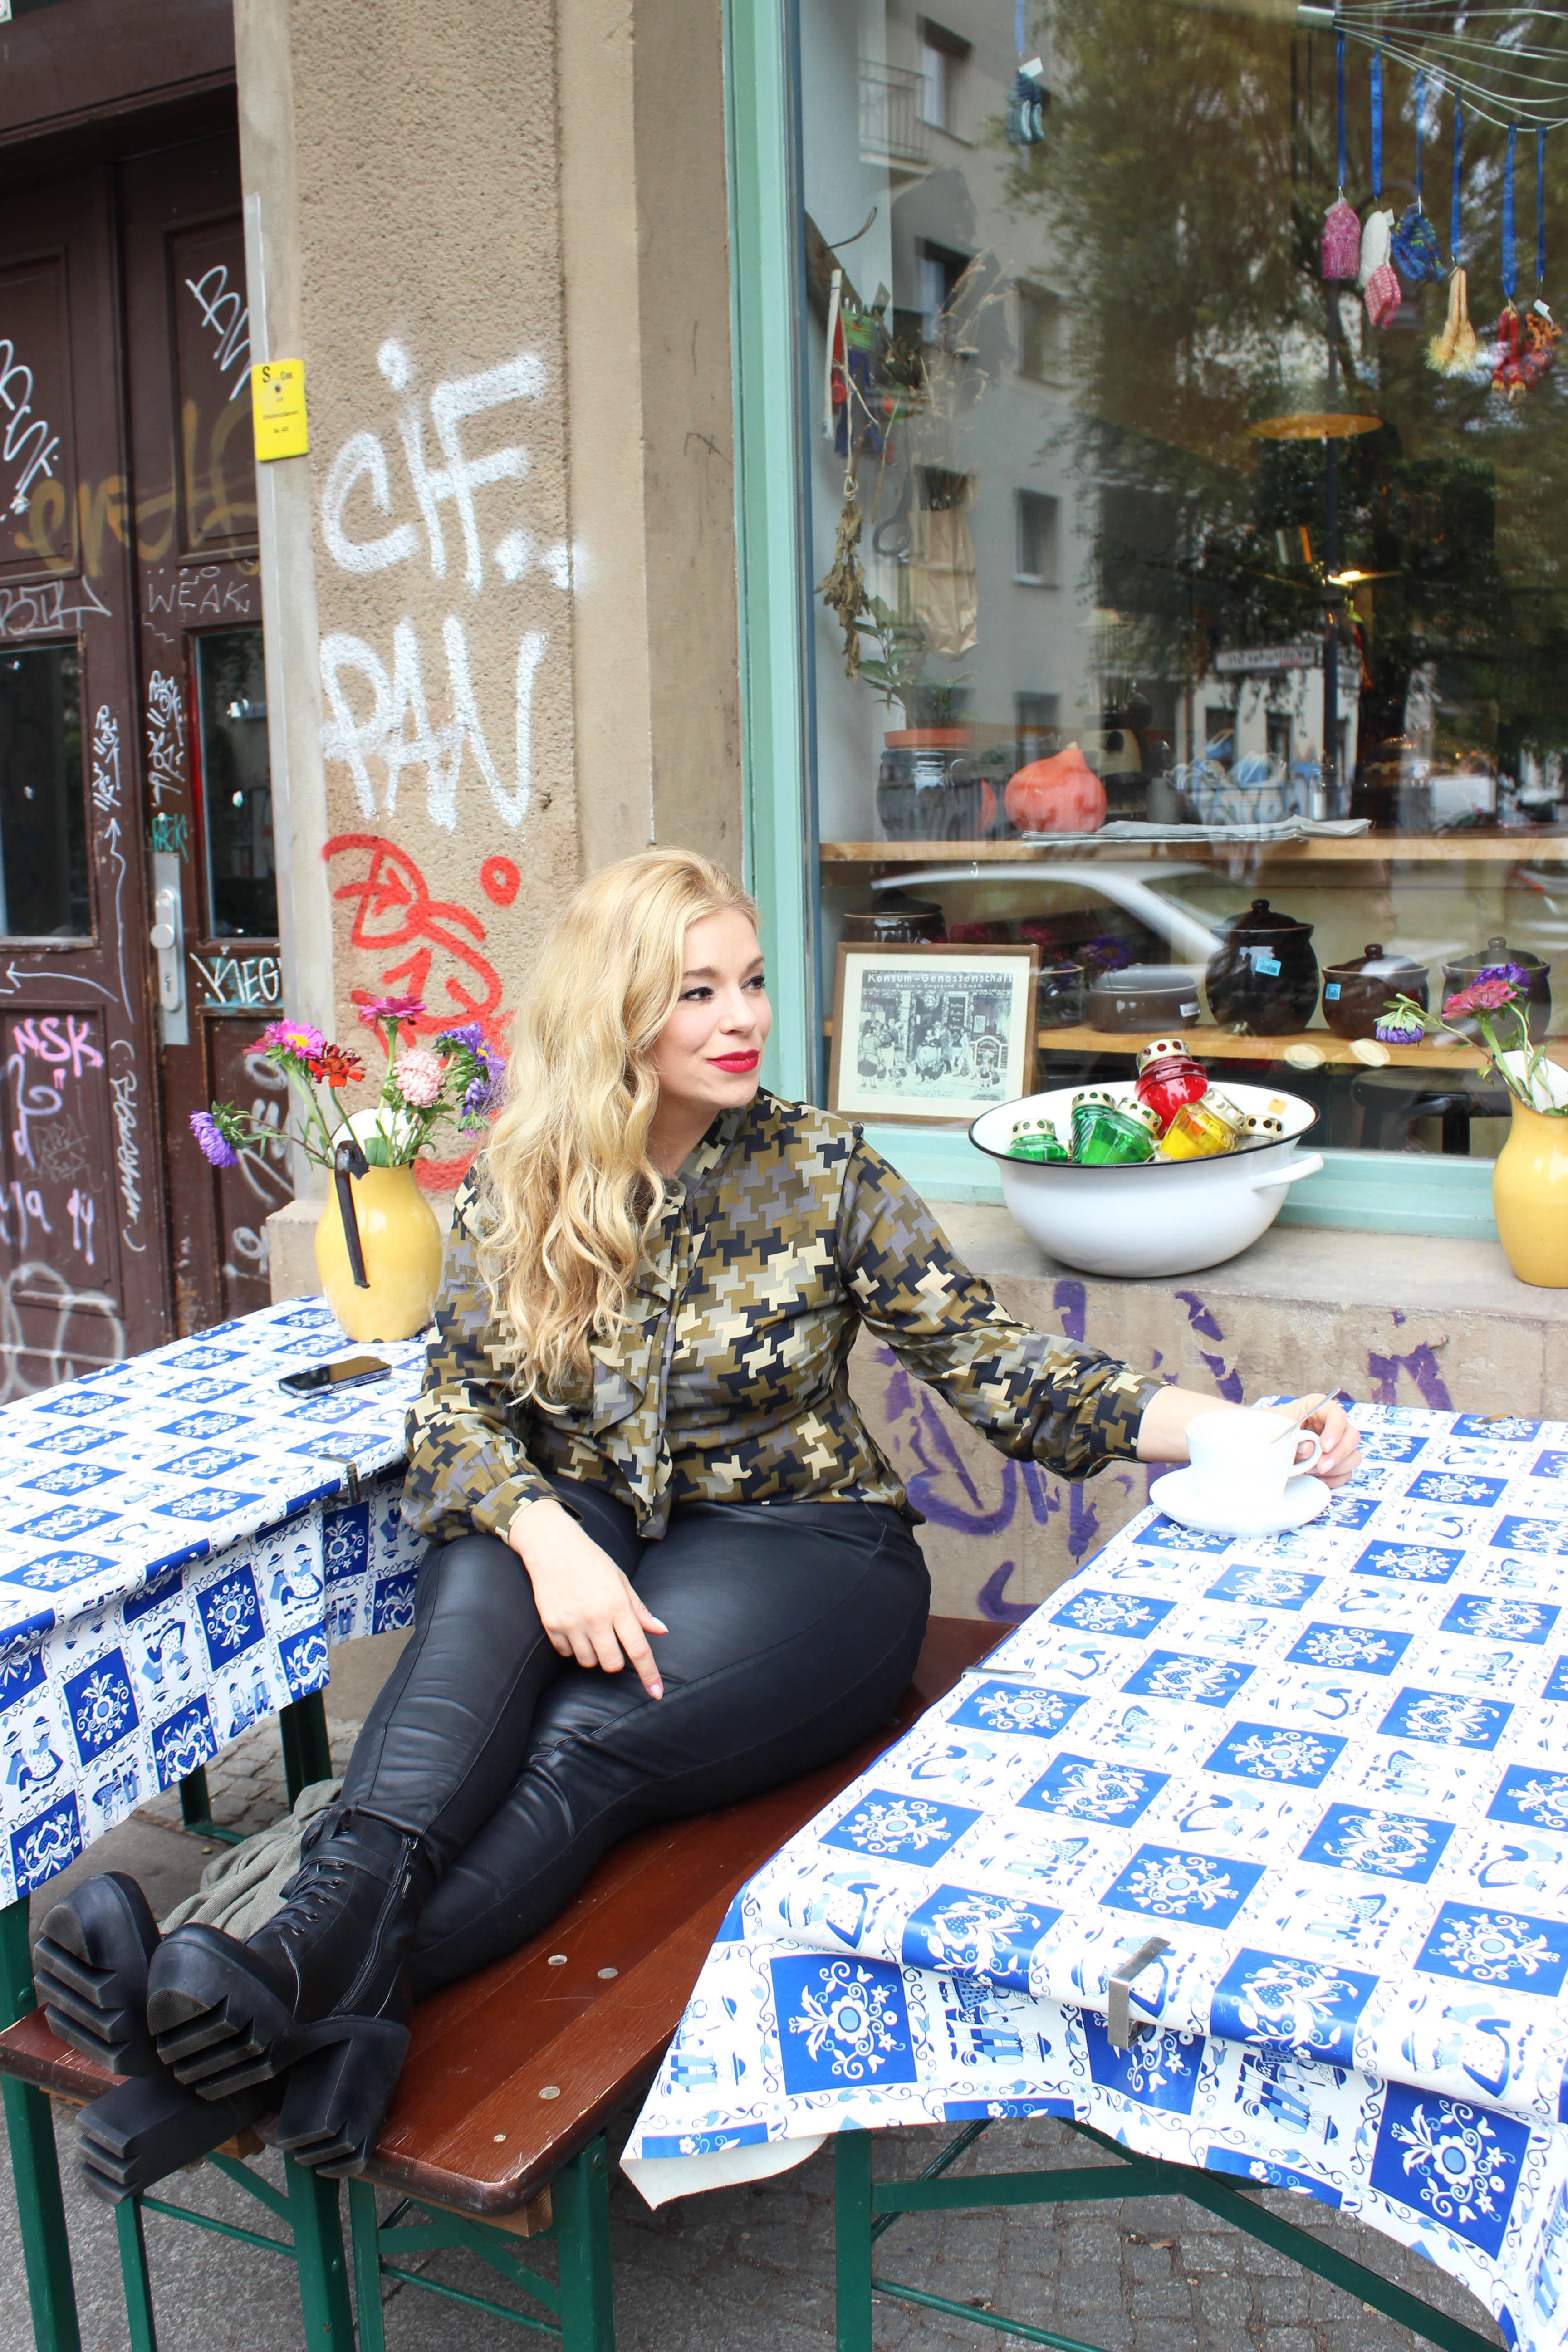 megabambi-Caterina-Pogorzelski-deutsche-plusiszeblogs